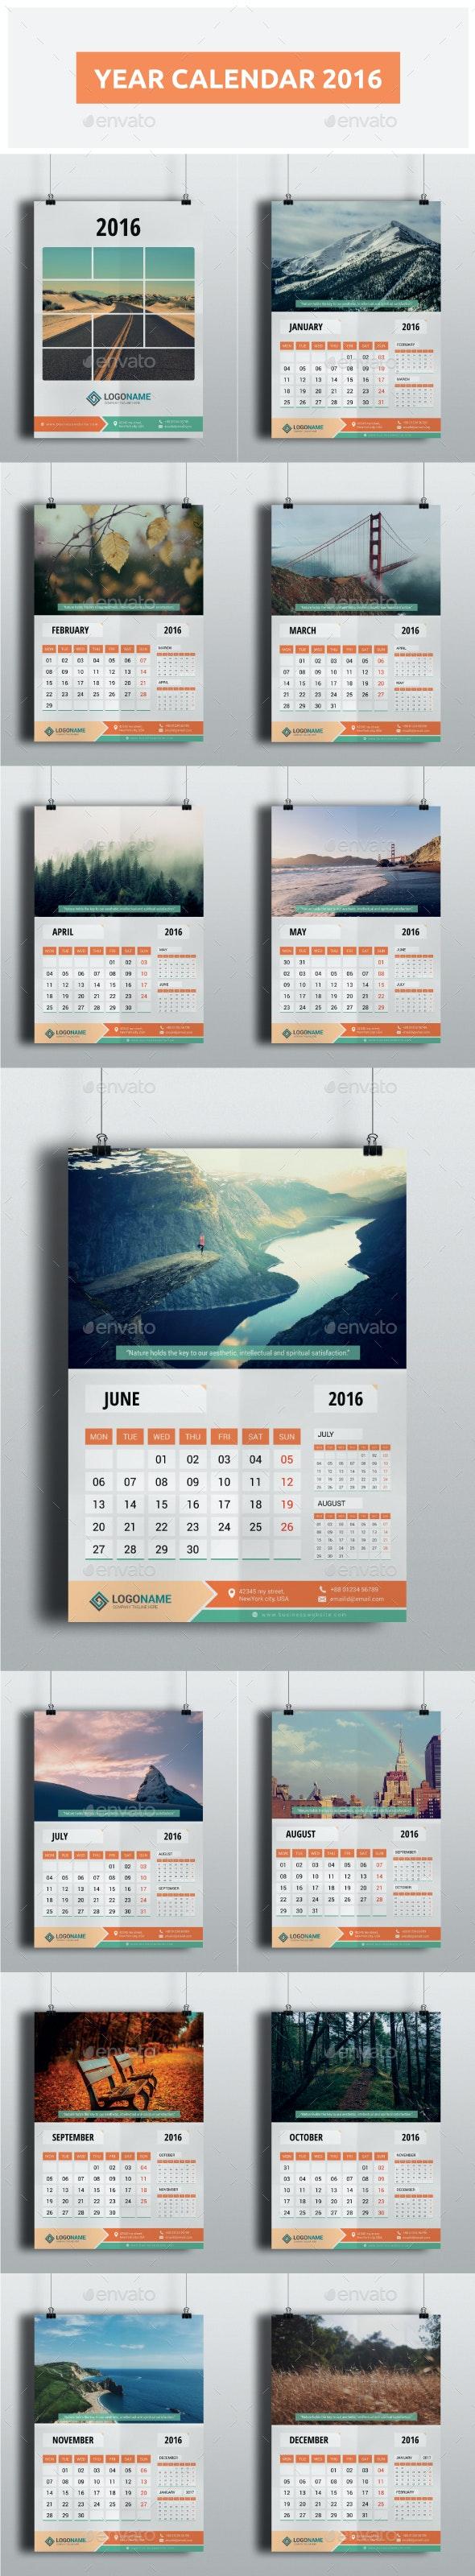 Year Calendar 2016 - Calendars Stationery